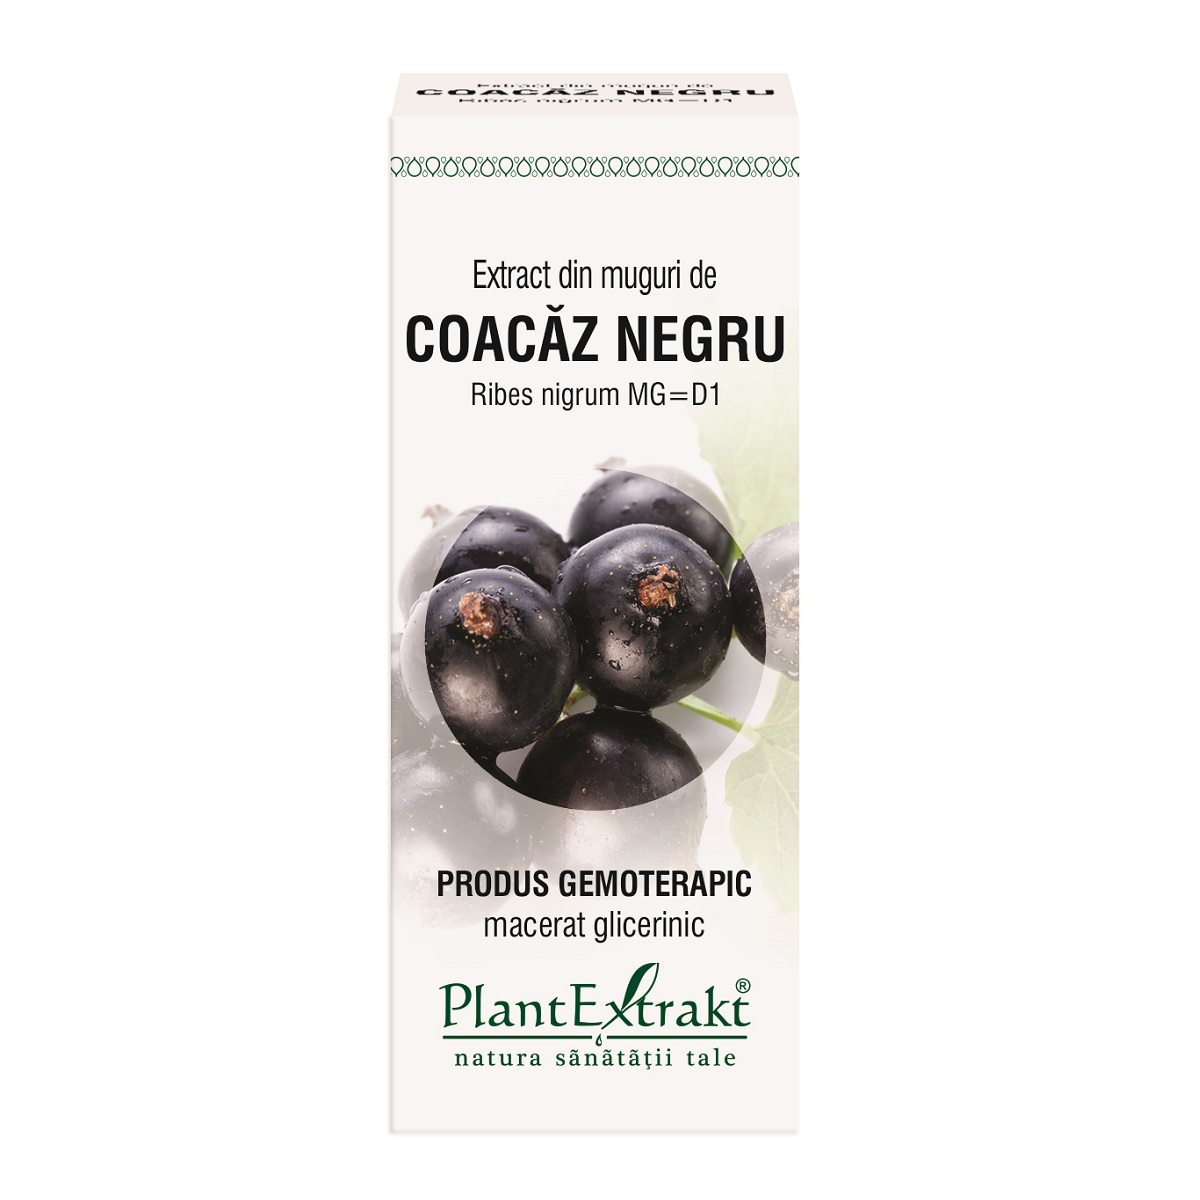 Extract din muguri de coacaz negru, 50ml, Plant Extrakt drmax.ro